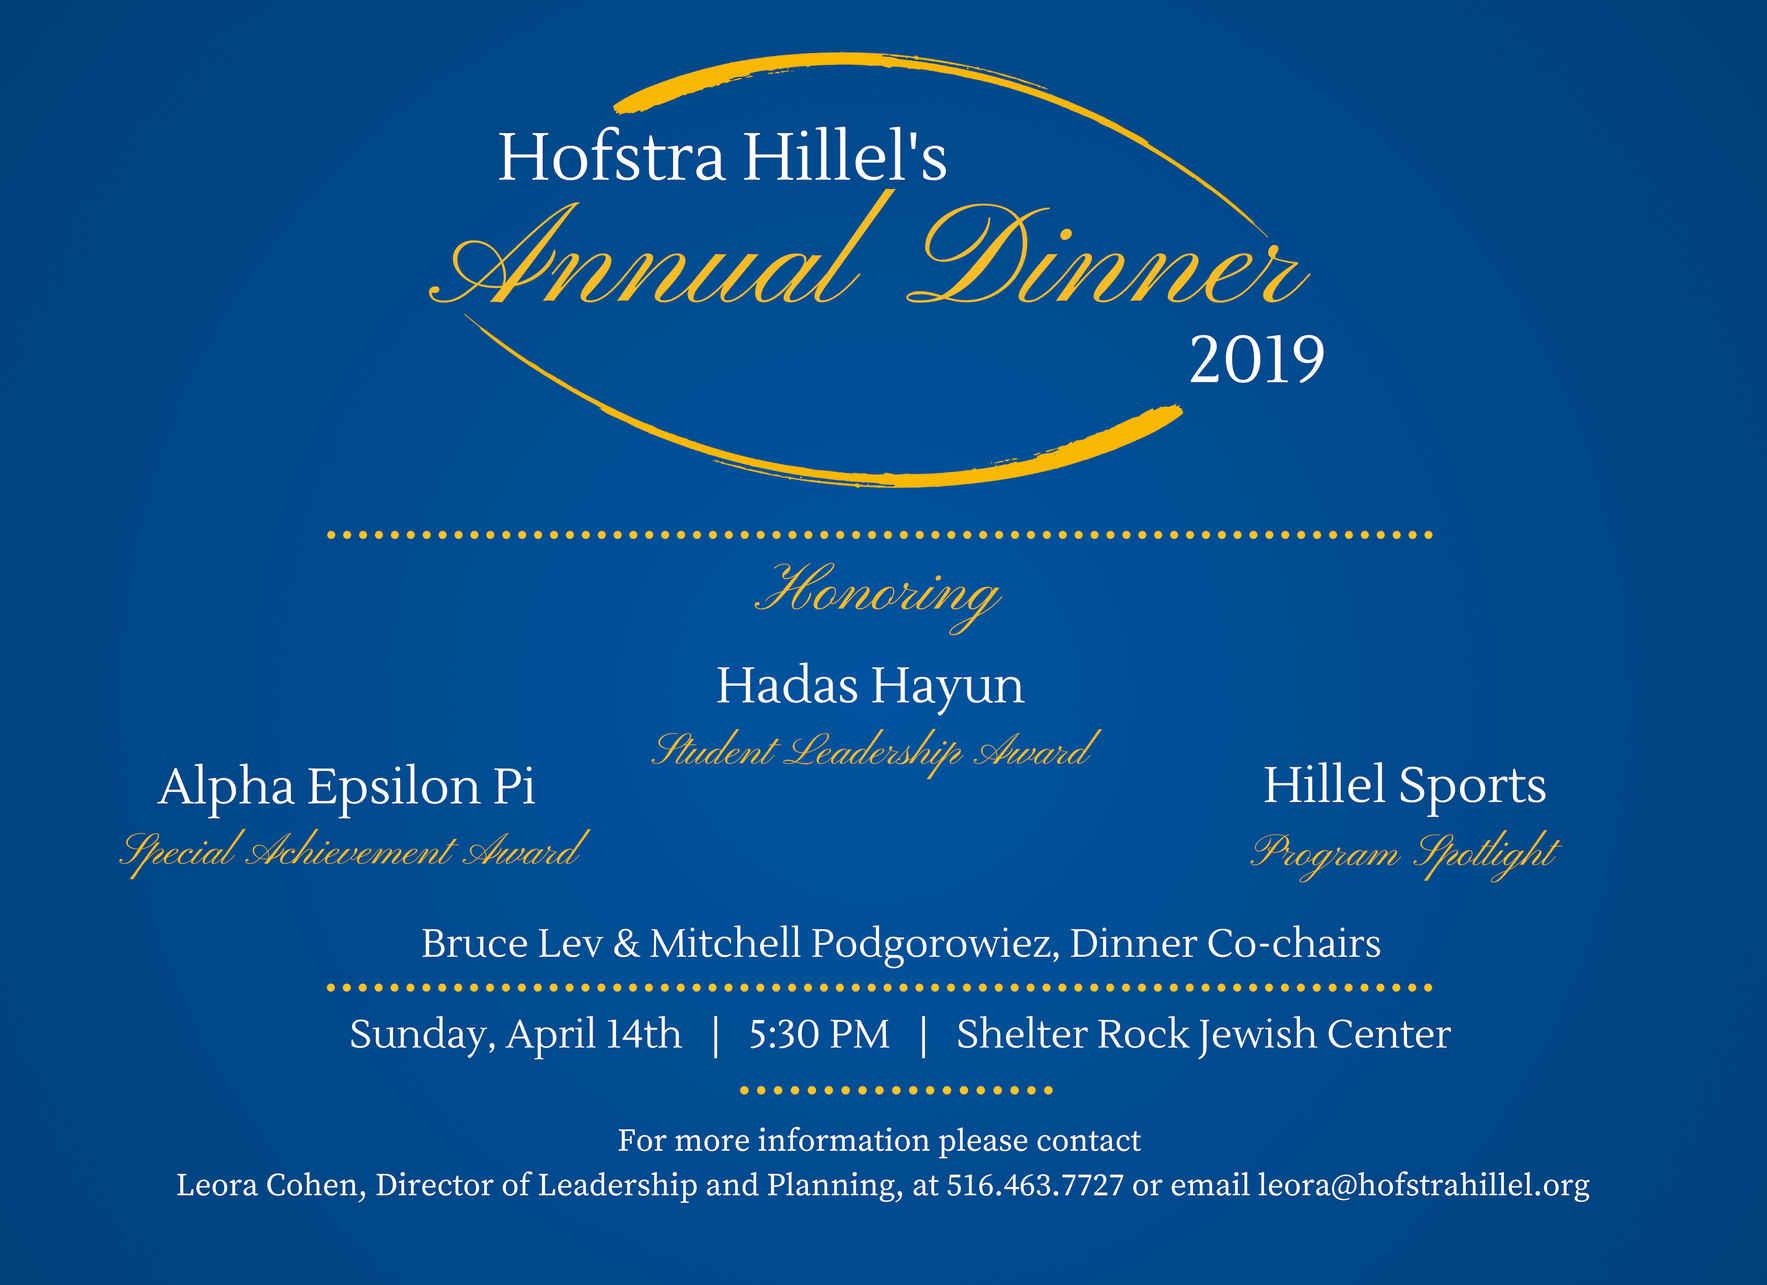 Hofstra Hillel Annual Dinner 2019 image